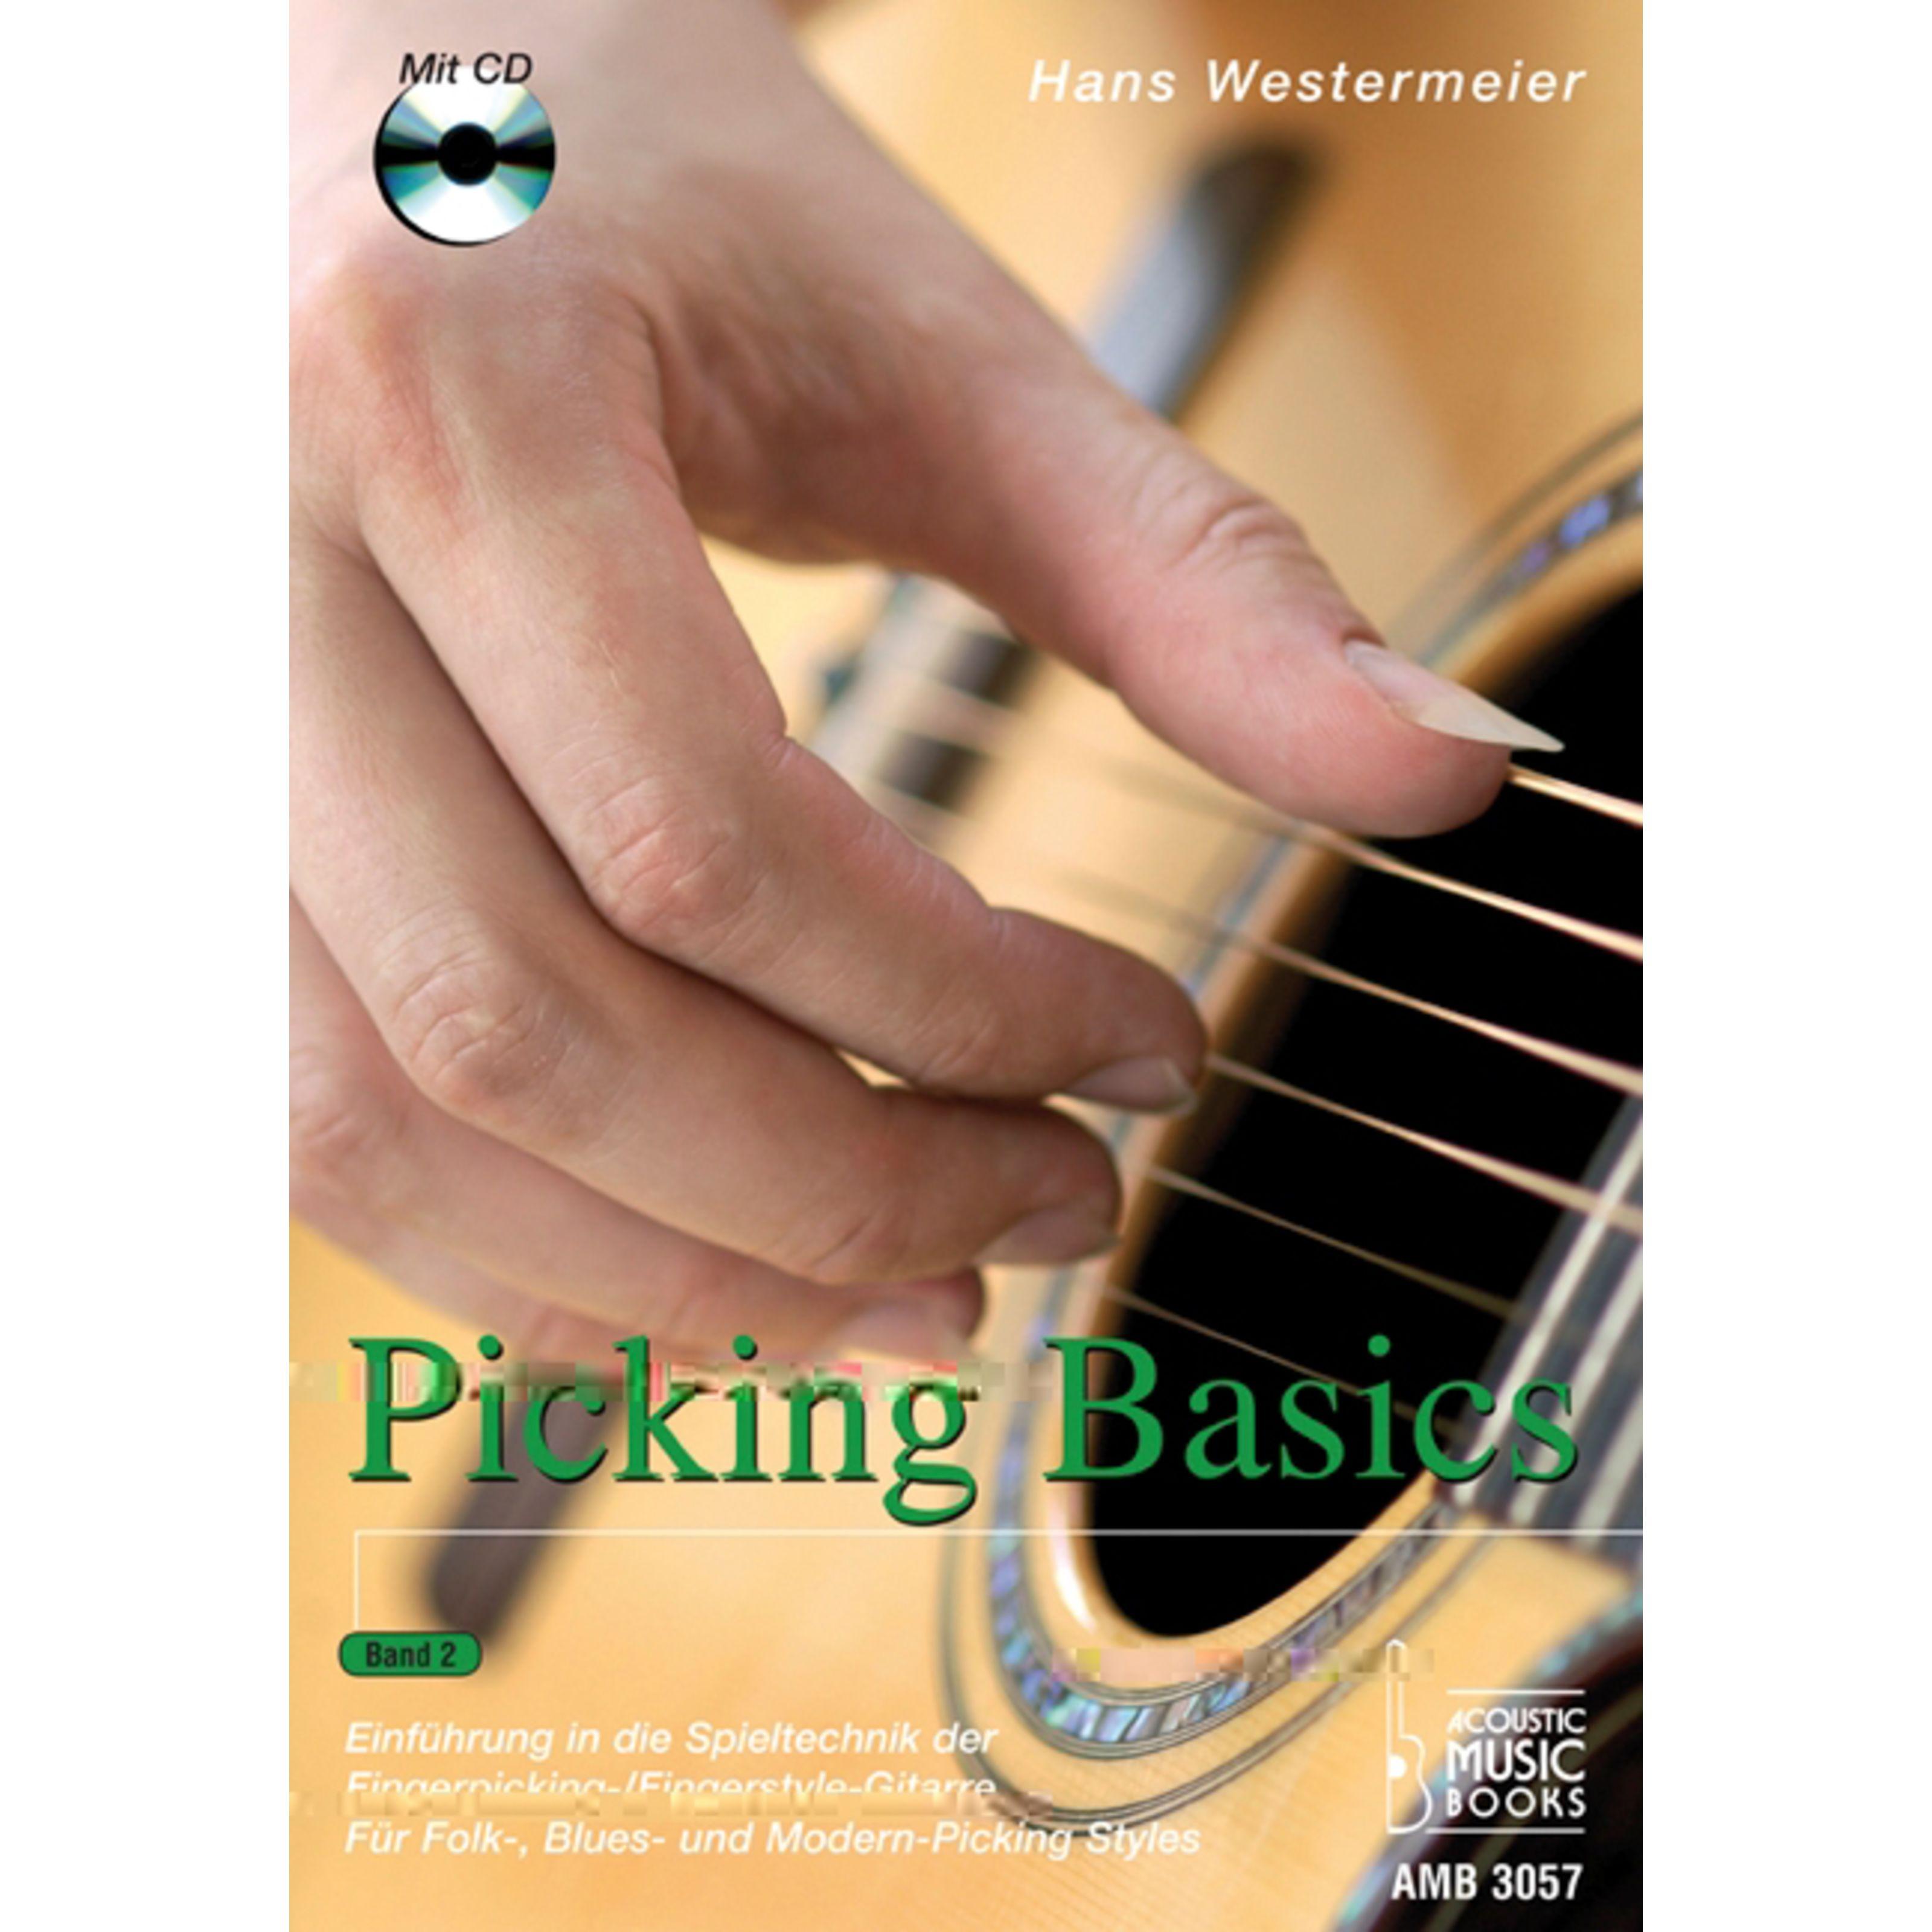 Acoustic Music Books - Picking Basics 2 für Gitarre Hans Westermeier, Buch/CD AMB 3057